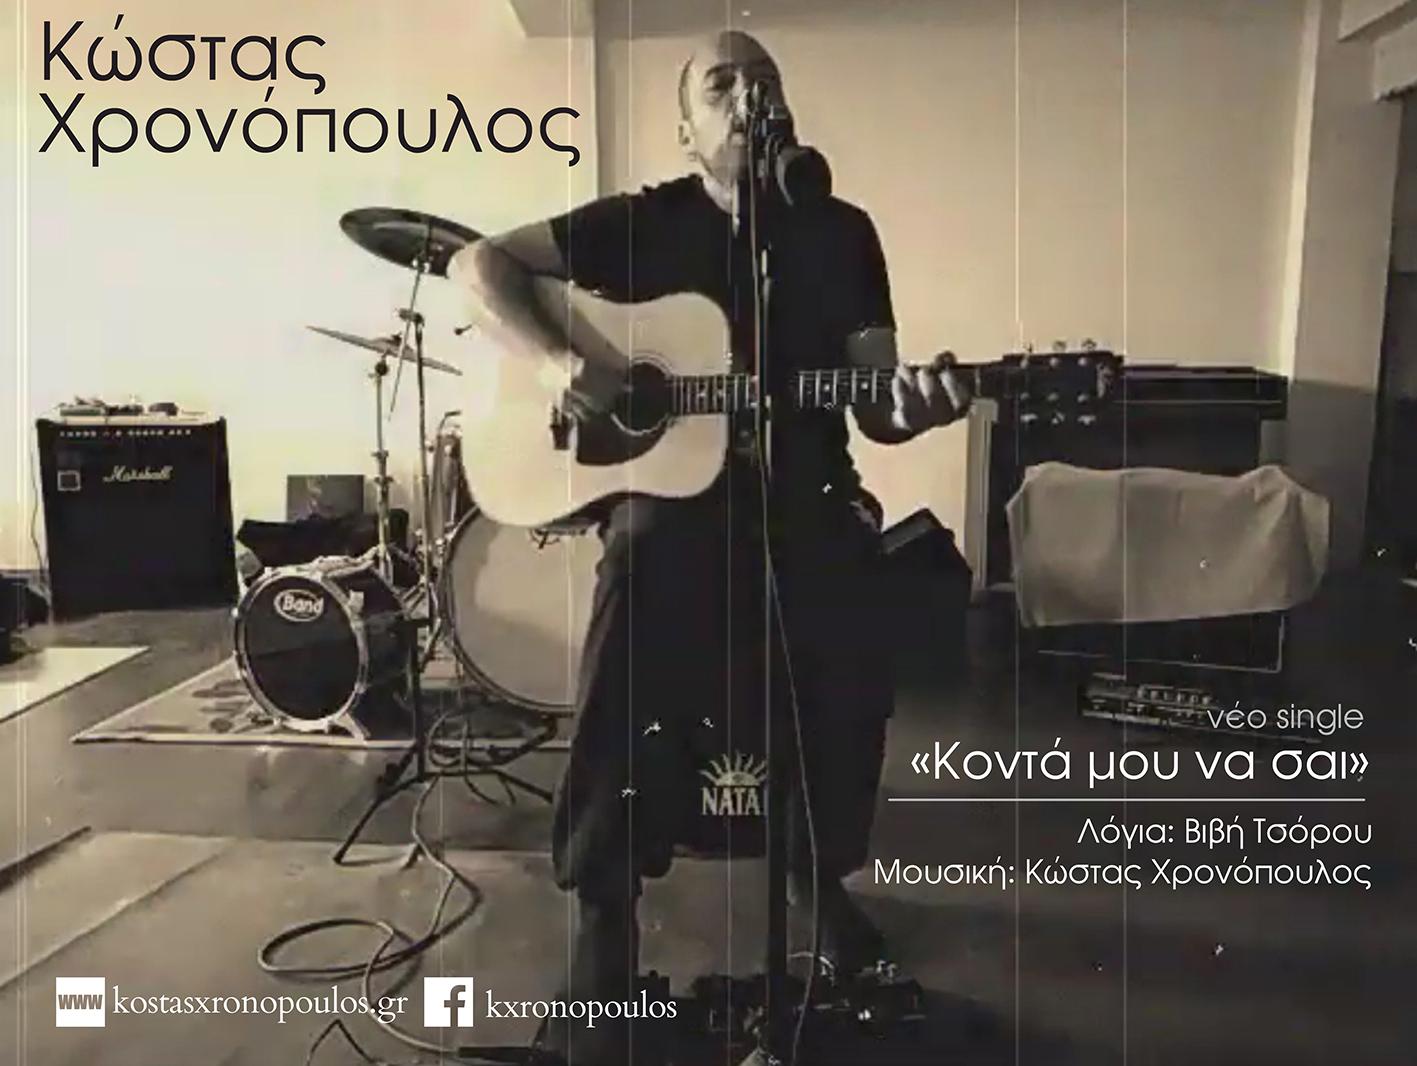 Kώστας Χρονόπουλος - «Κοντά μου να 'σαι» (VIDEO)